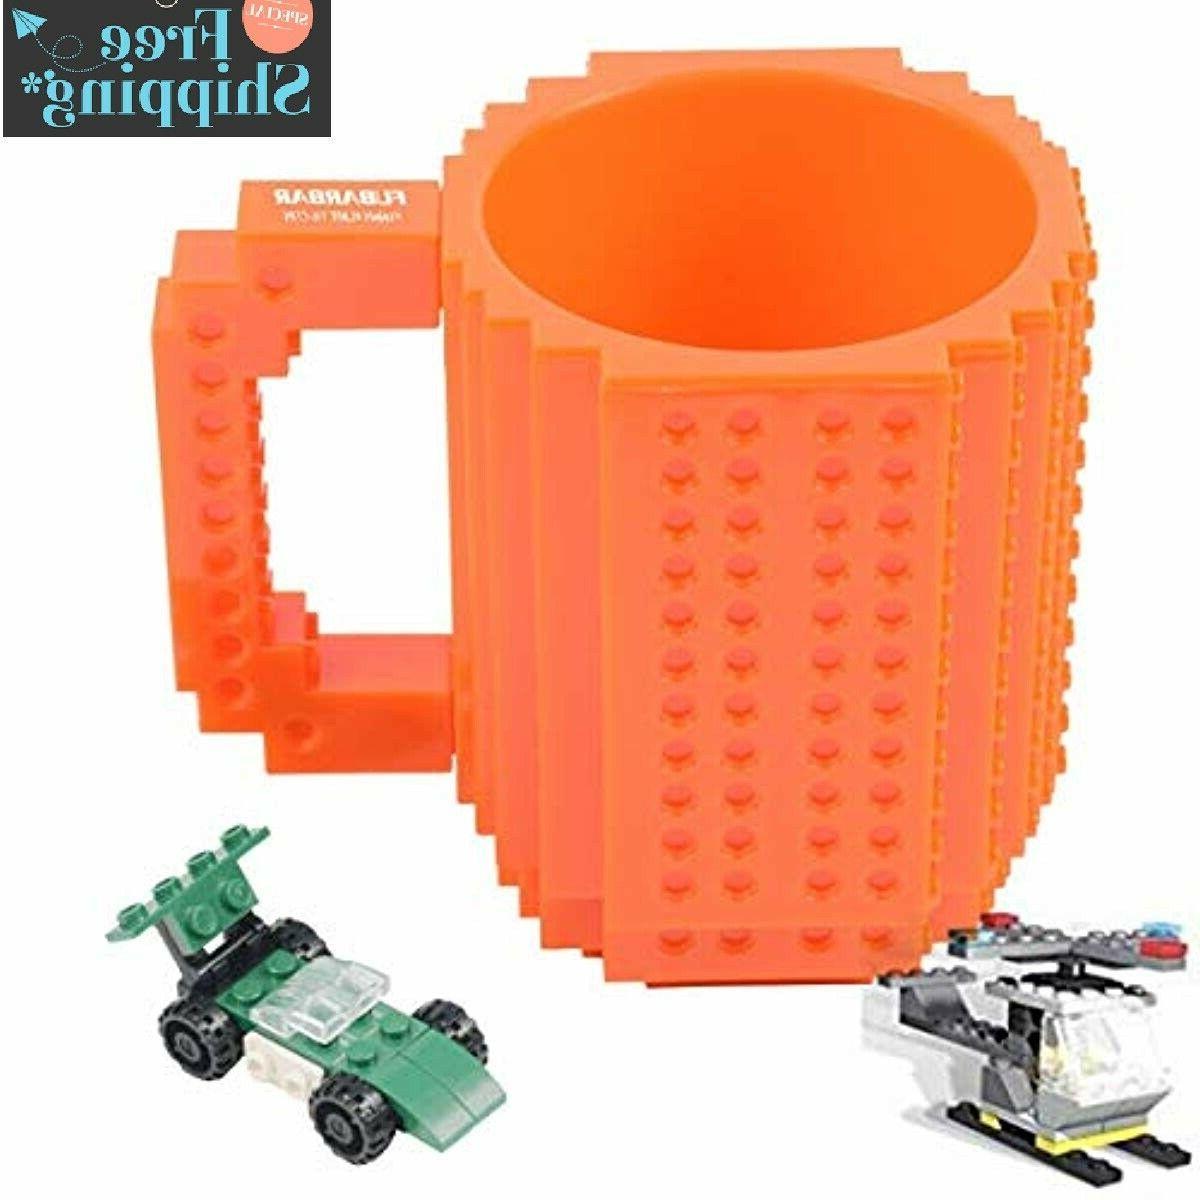 brick mugs updated version fubarbar 12 oz